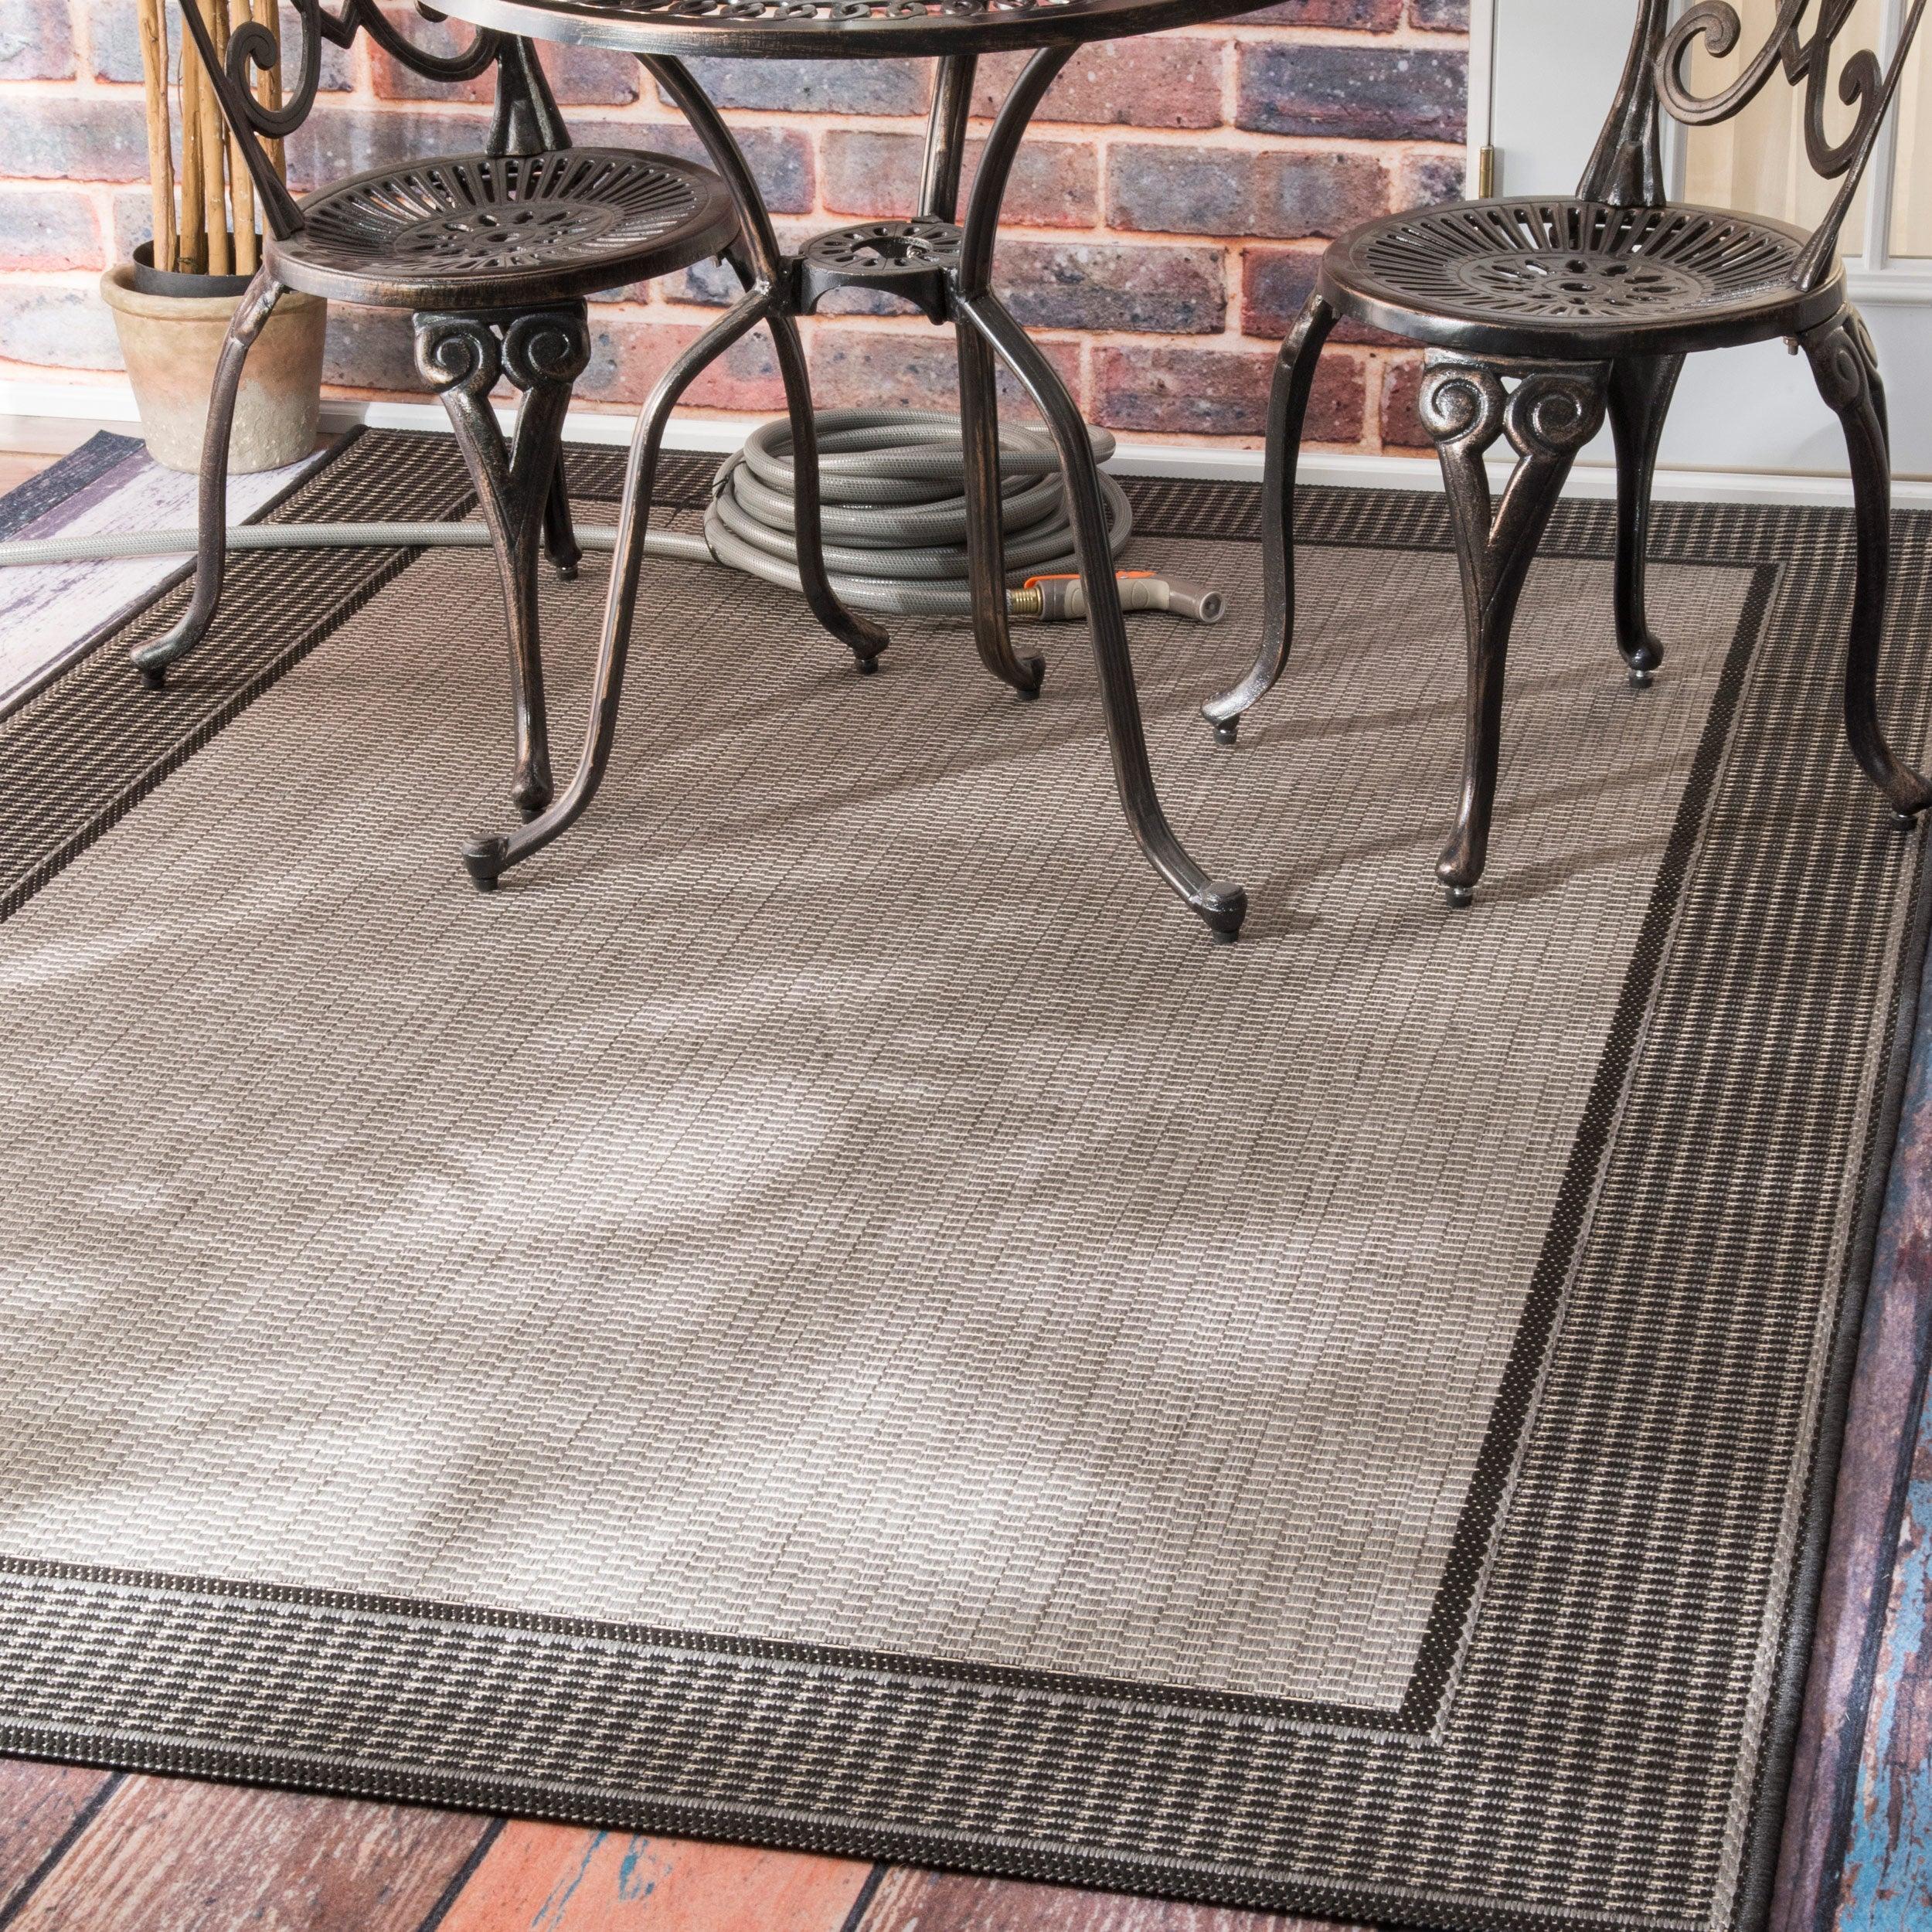 nuLOOM Solid Border Outdoor Indoor Area Rug 7 10 x 10 10 Free